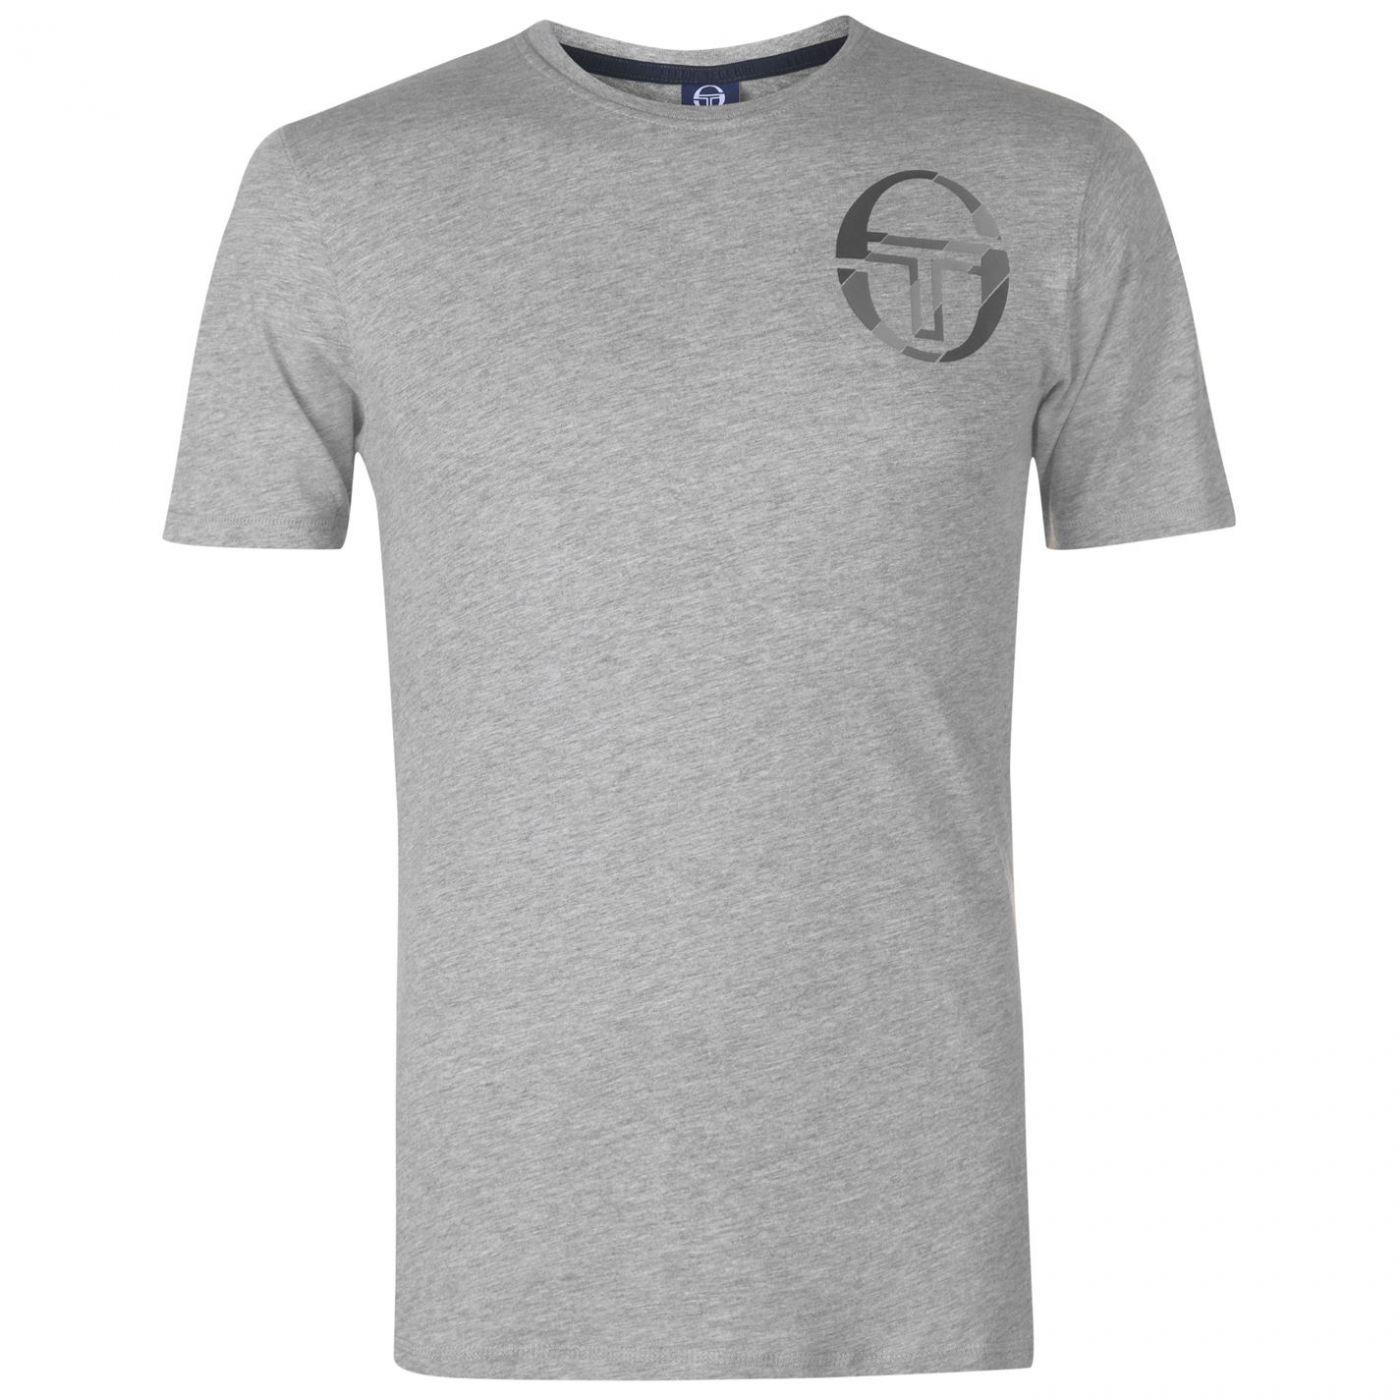 Sergio Tacchini Zang T Shirt Mens